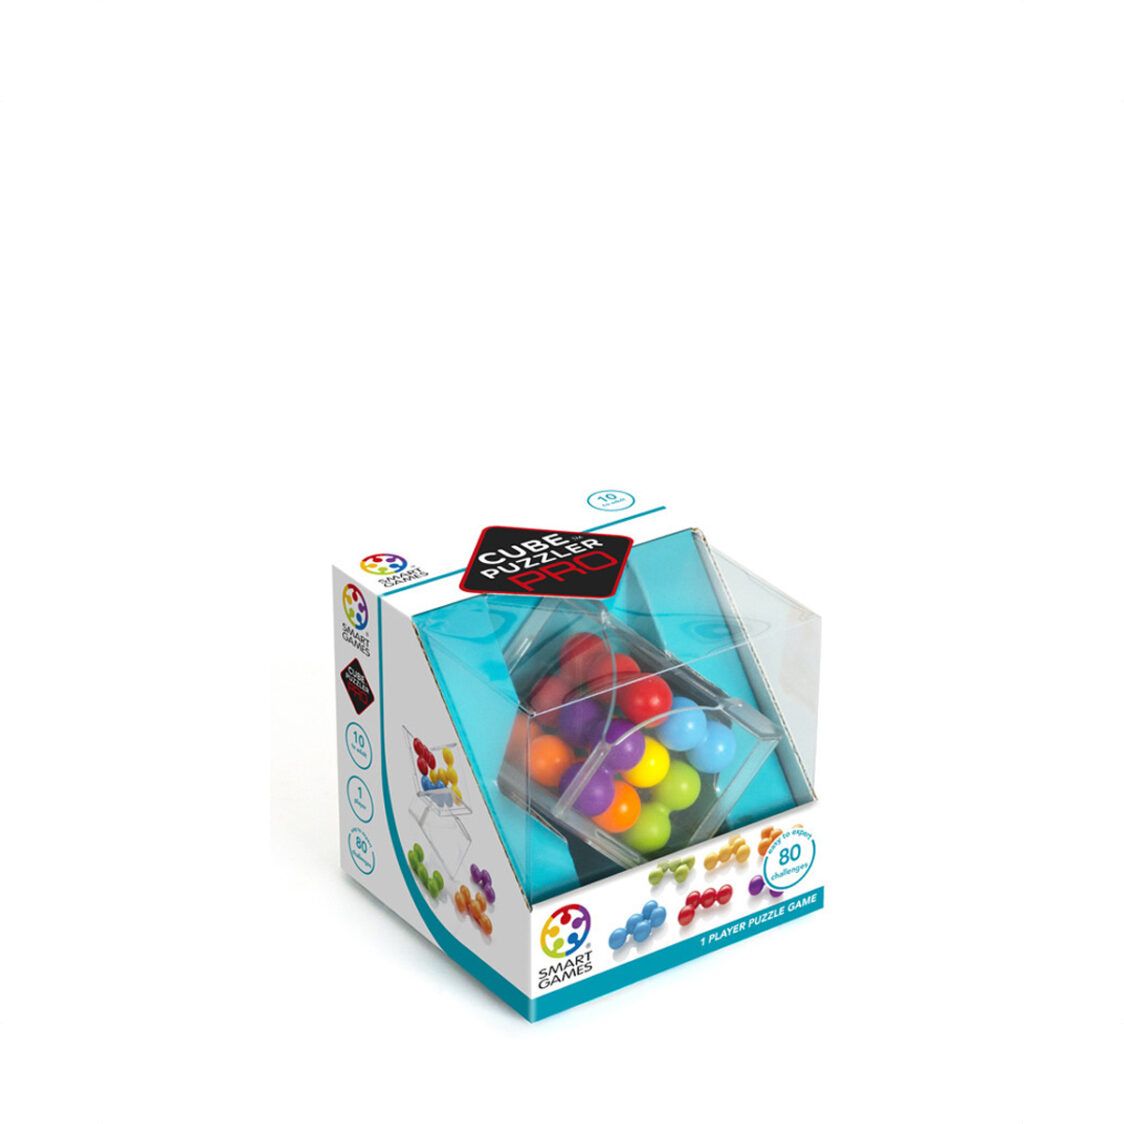 Smart Games Cube Puzzler - Pro